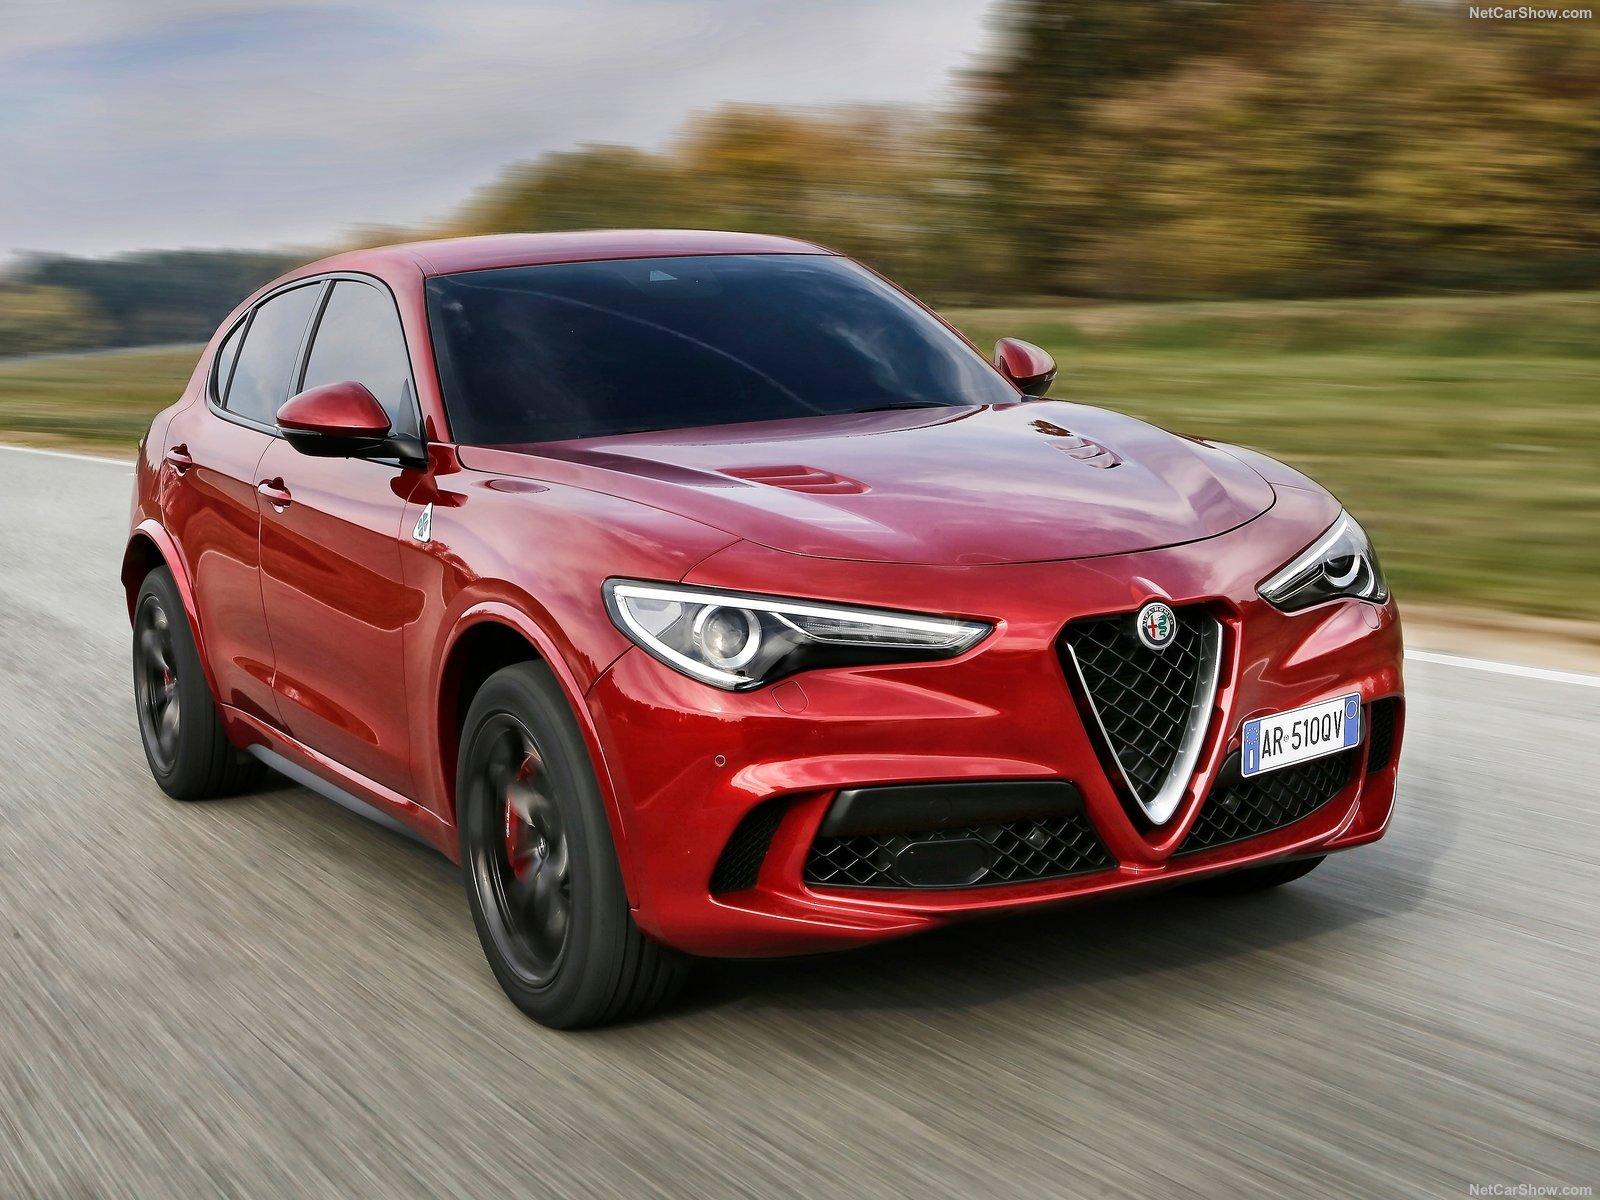 Alfa_Romeo-Stelvio_Quadrifoglio-2018-1600-06